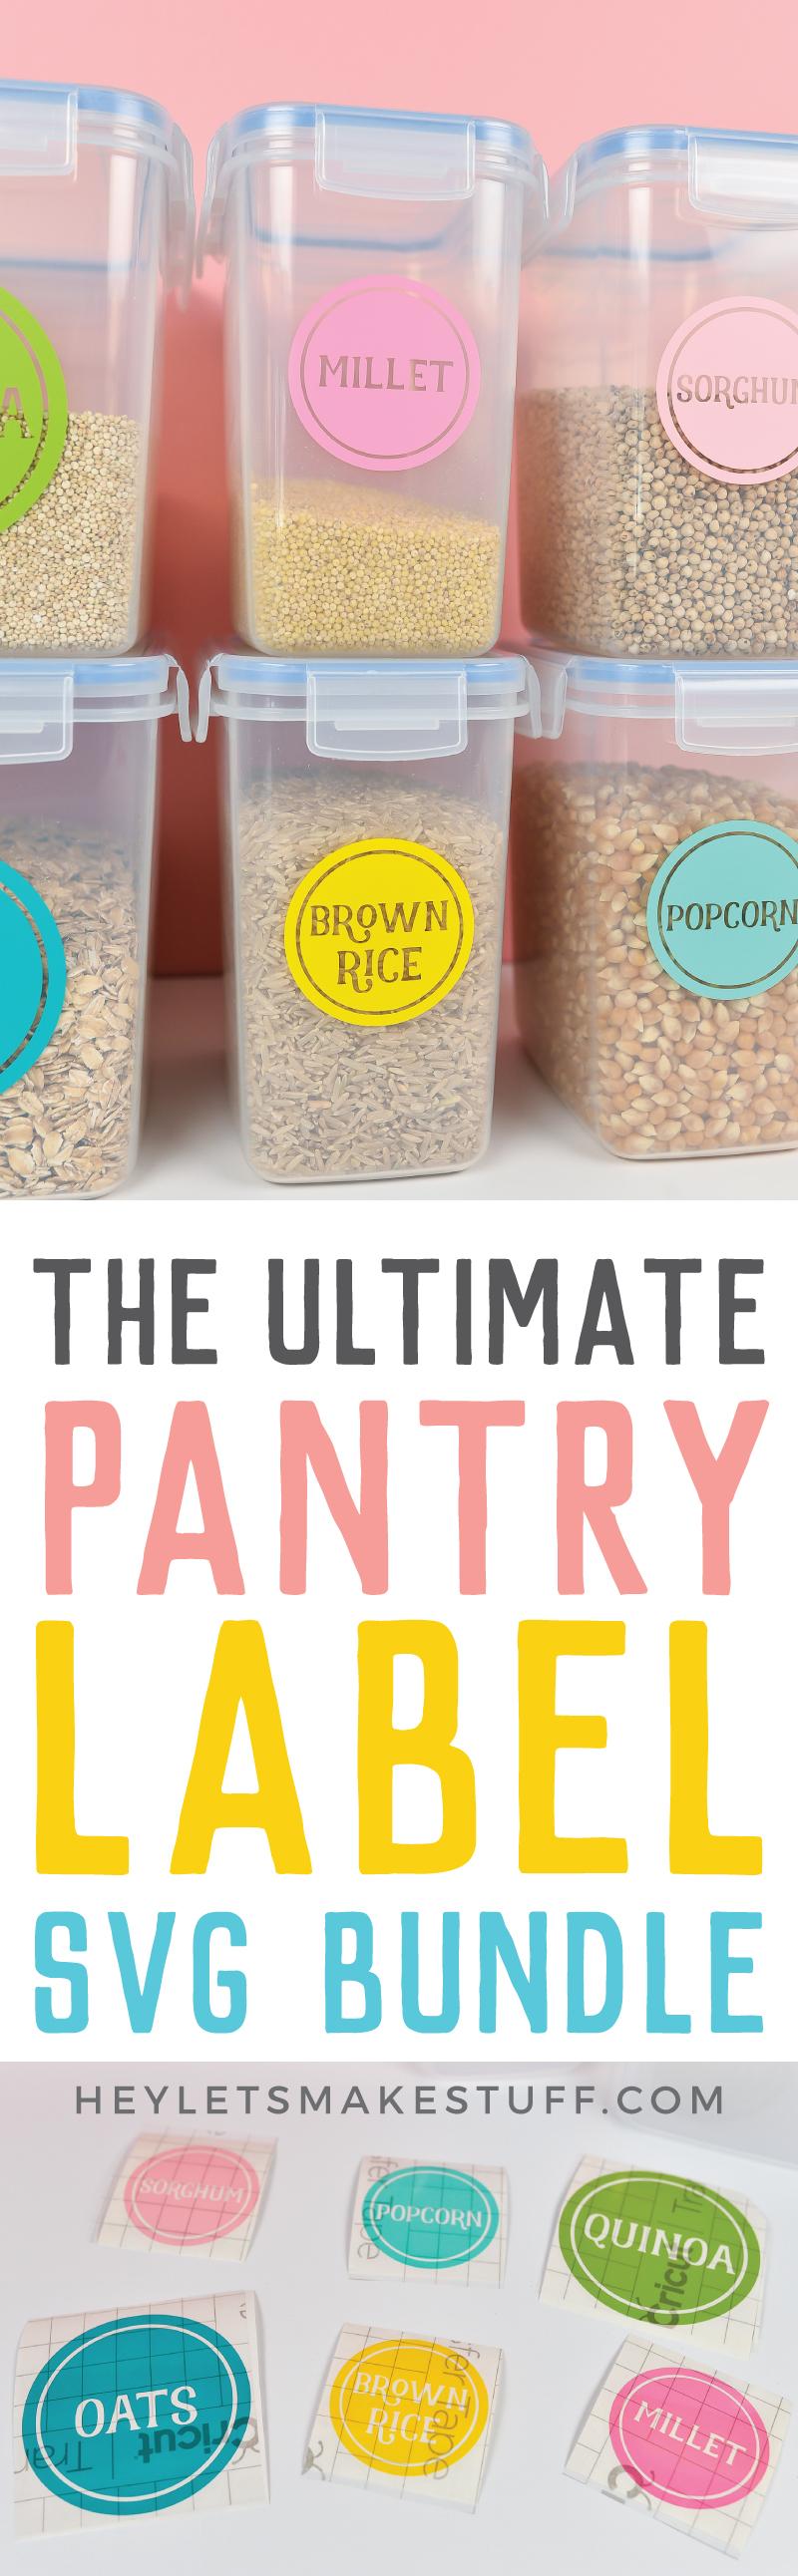 Colorful pantry label set